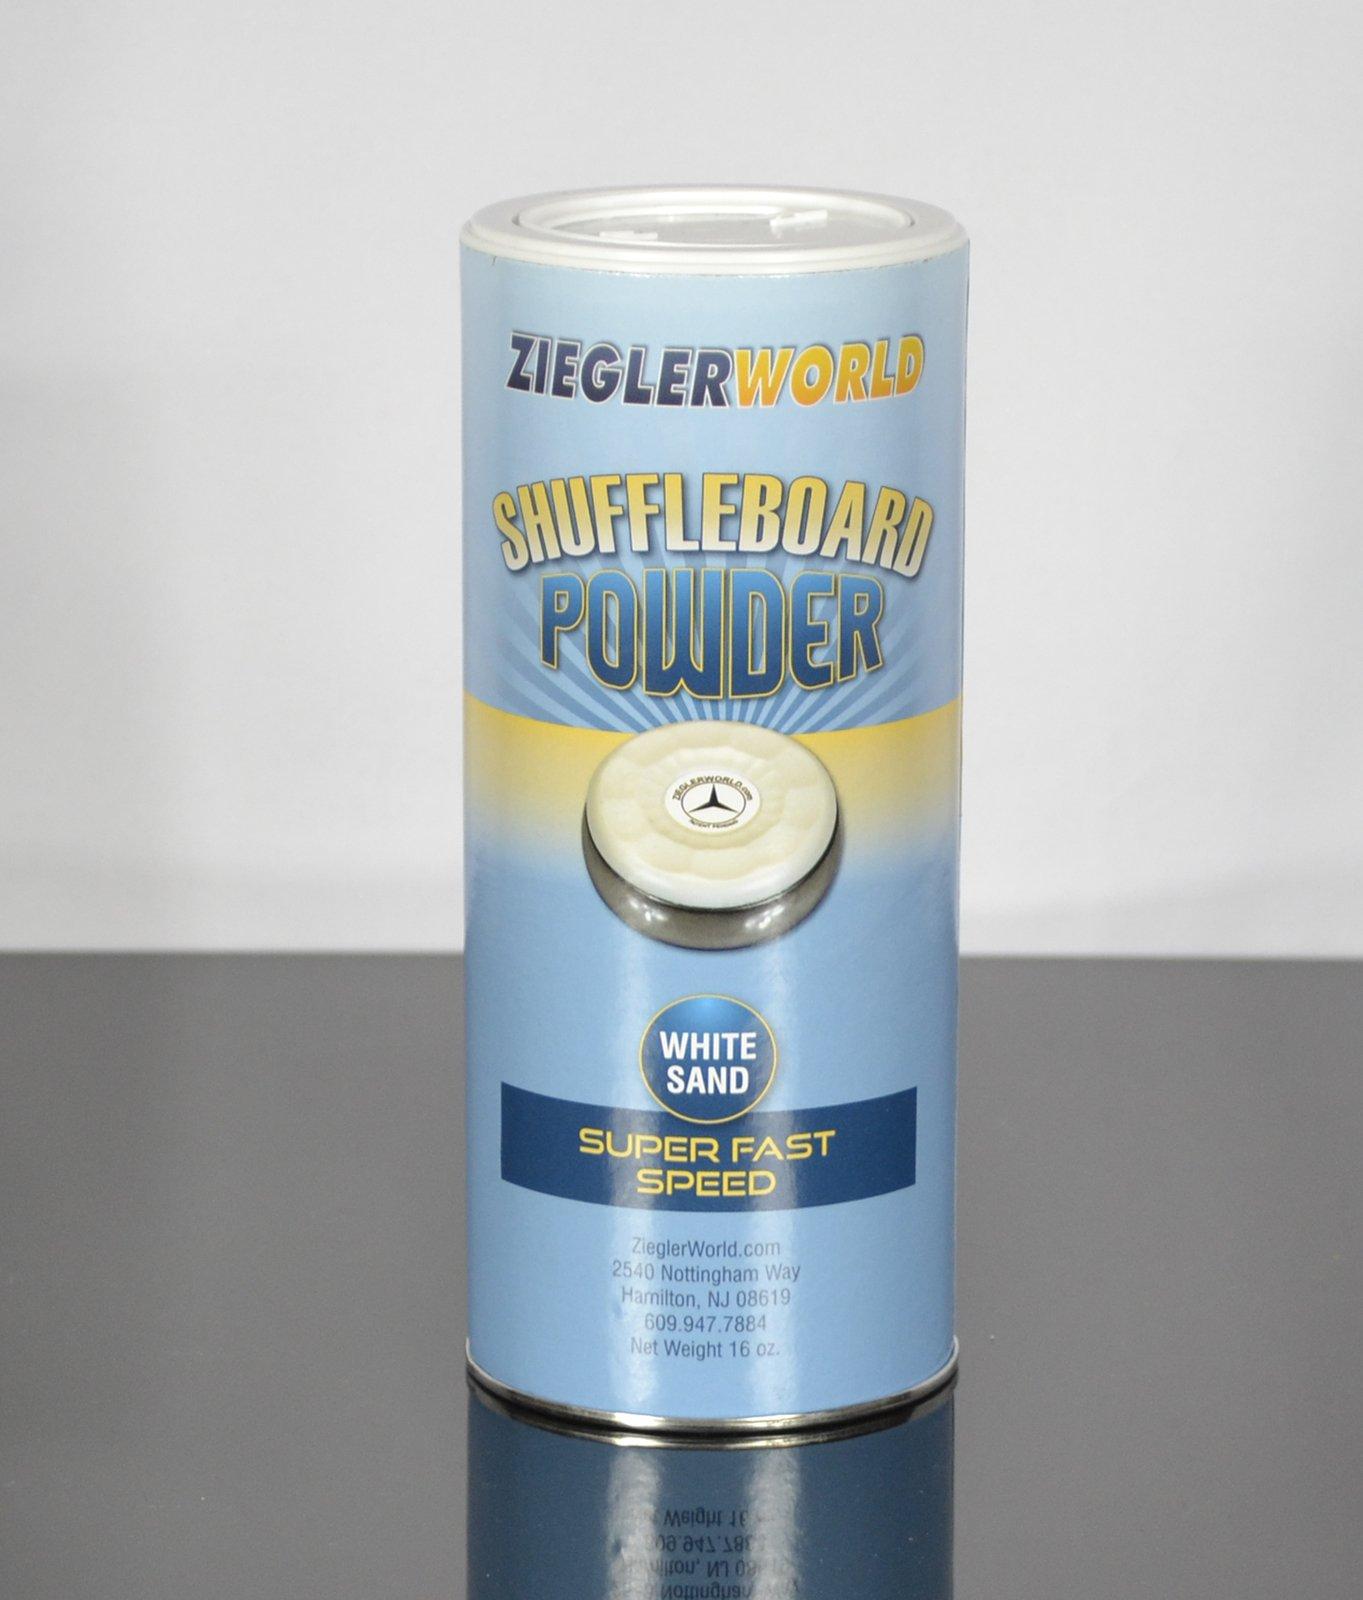 Zieglerworld 1 can Table Shuffleboard White Sand Powder Wax - Super Fast Speed by Zieglerworld